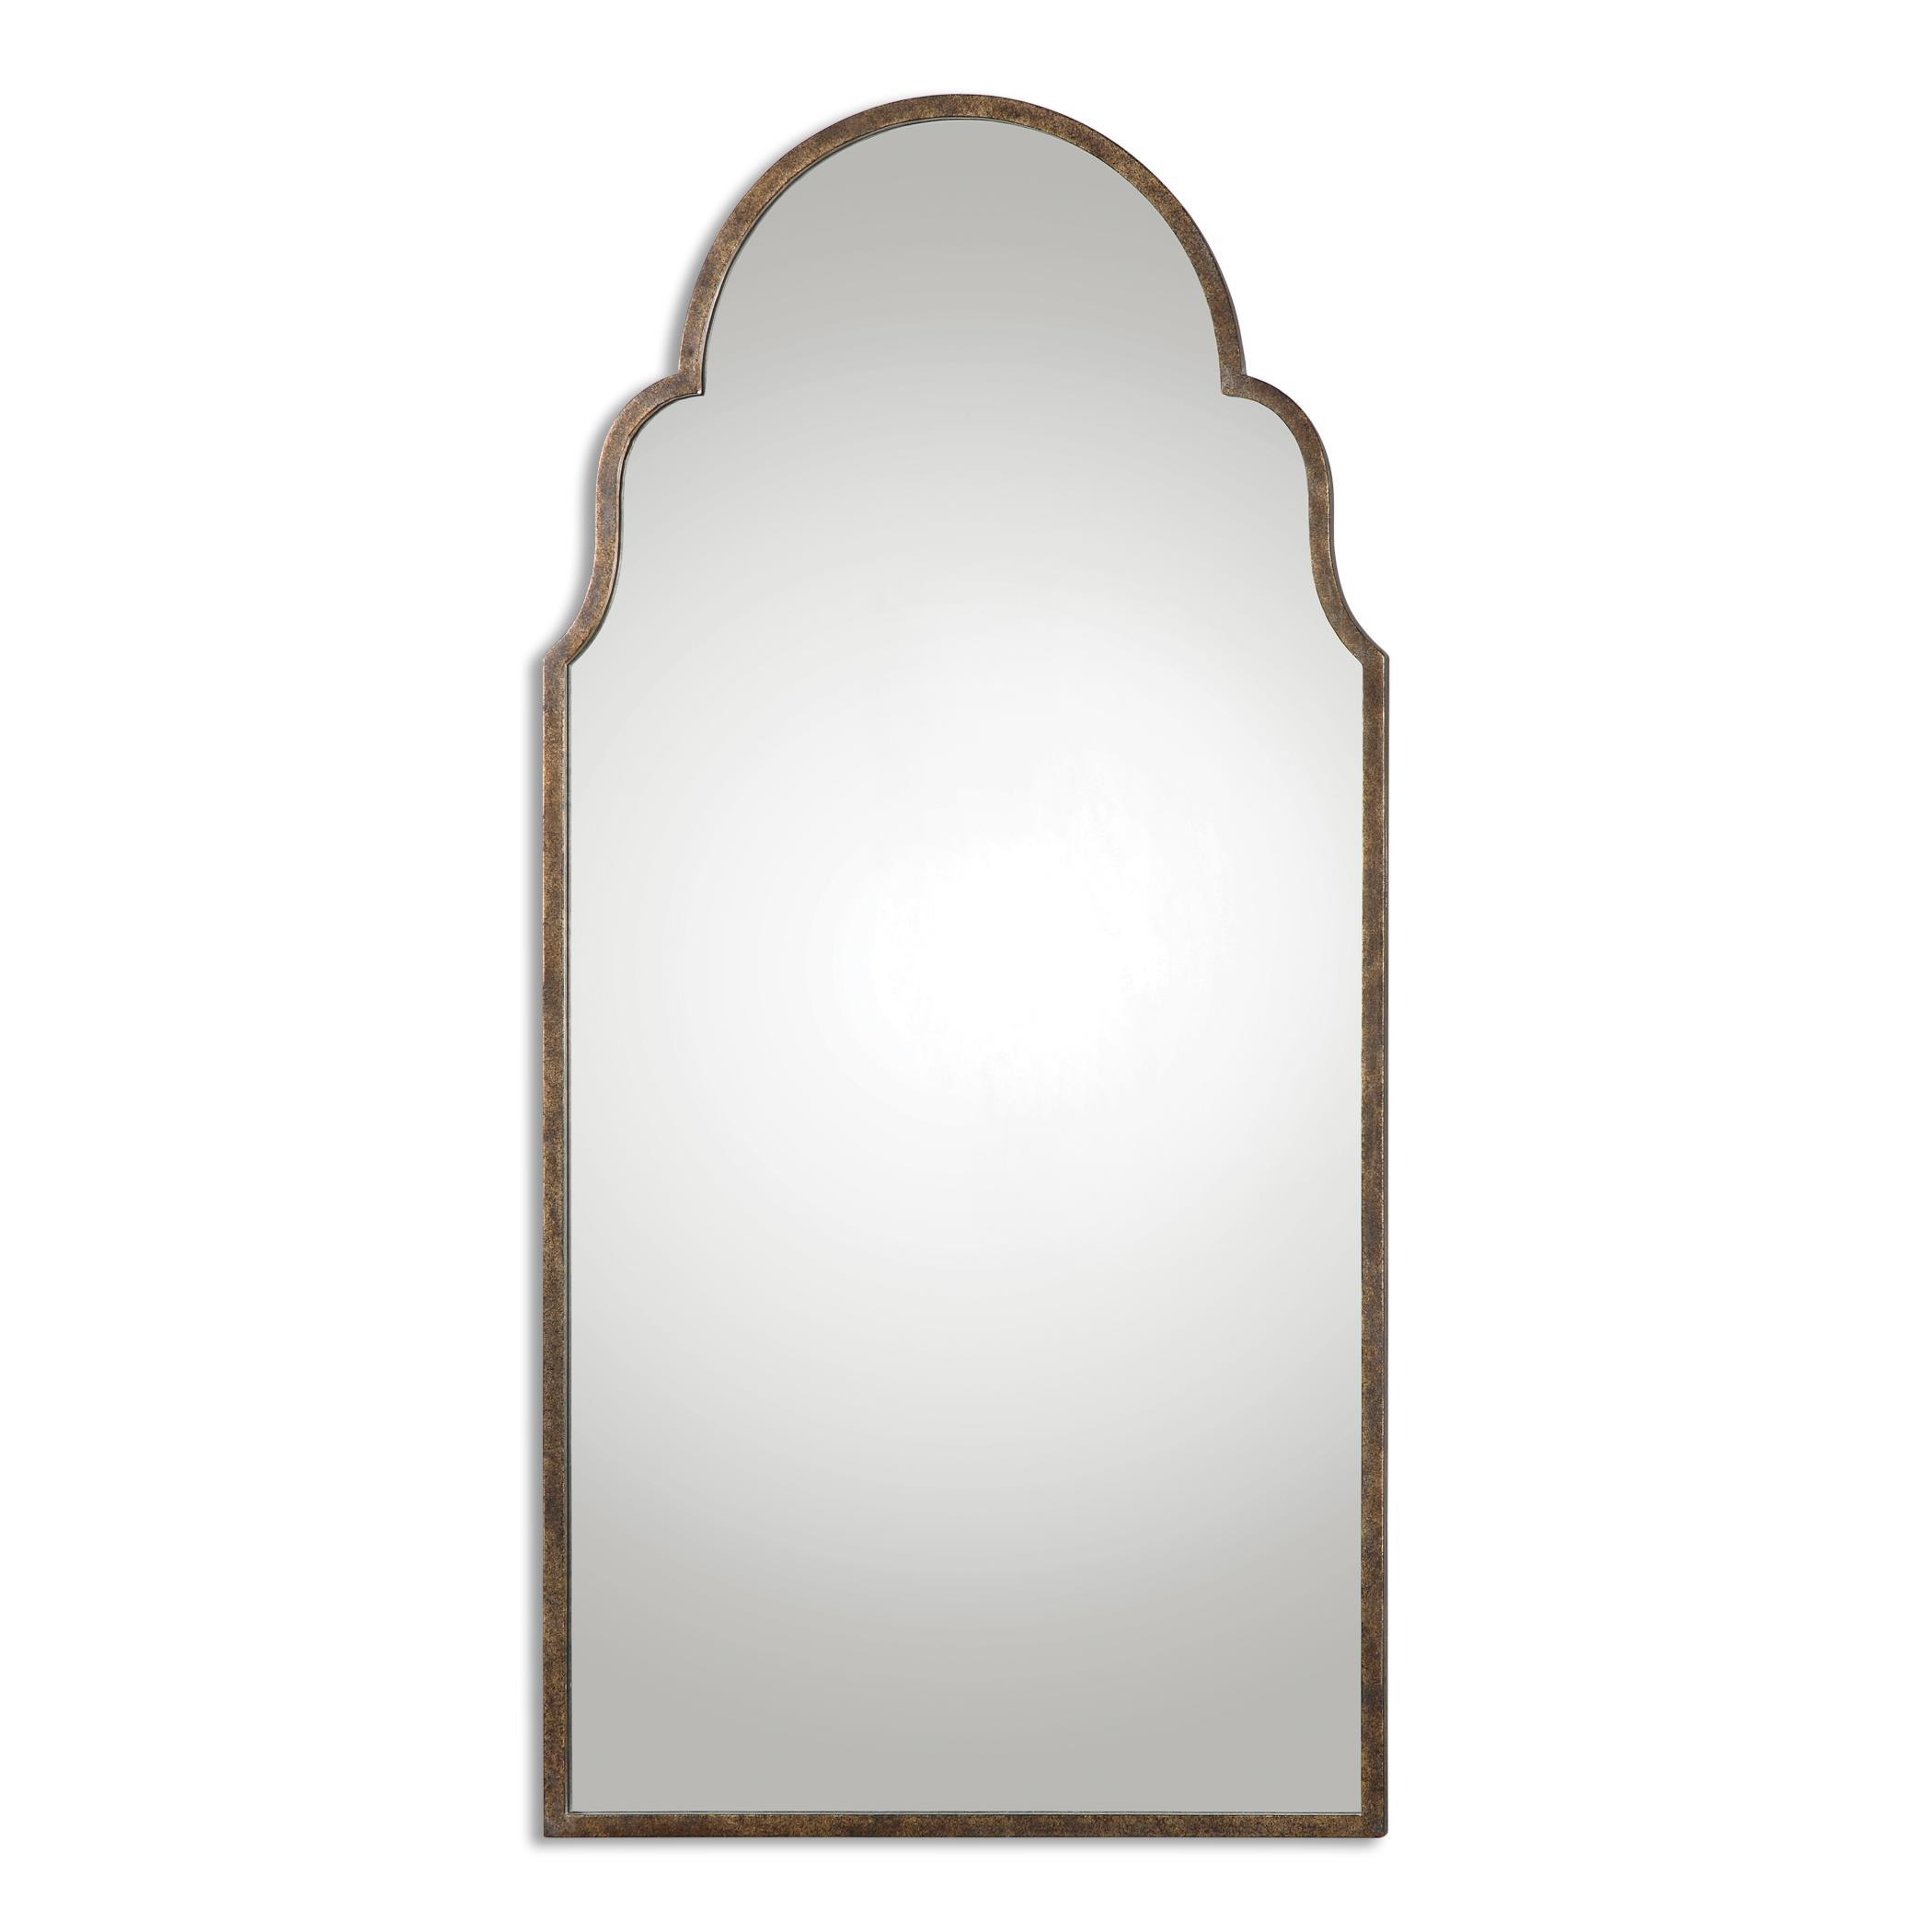 Arched Mirrors Brayden Tall Arch Mirror by Uttermost at Mueller Furniture